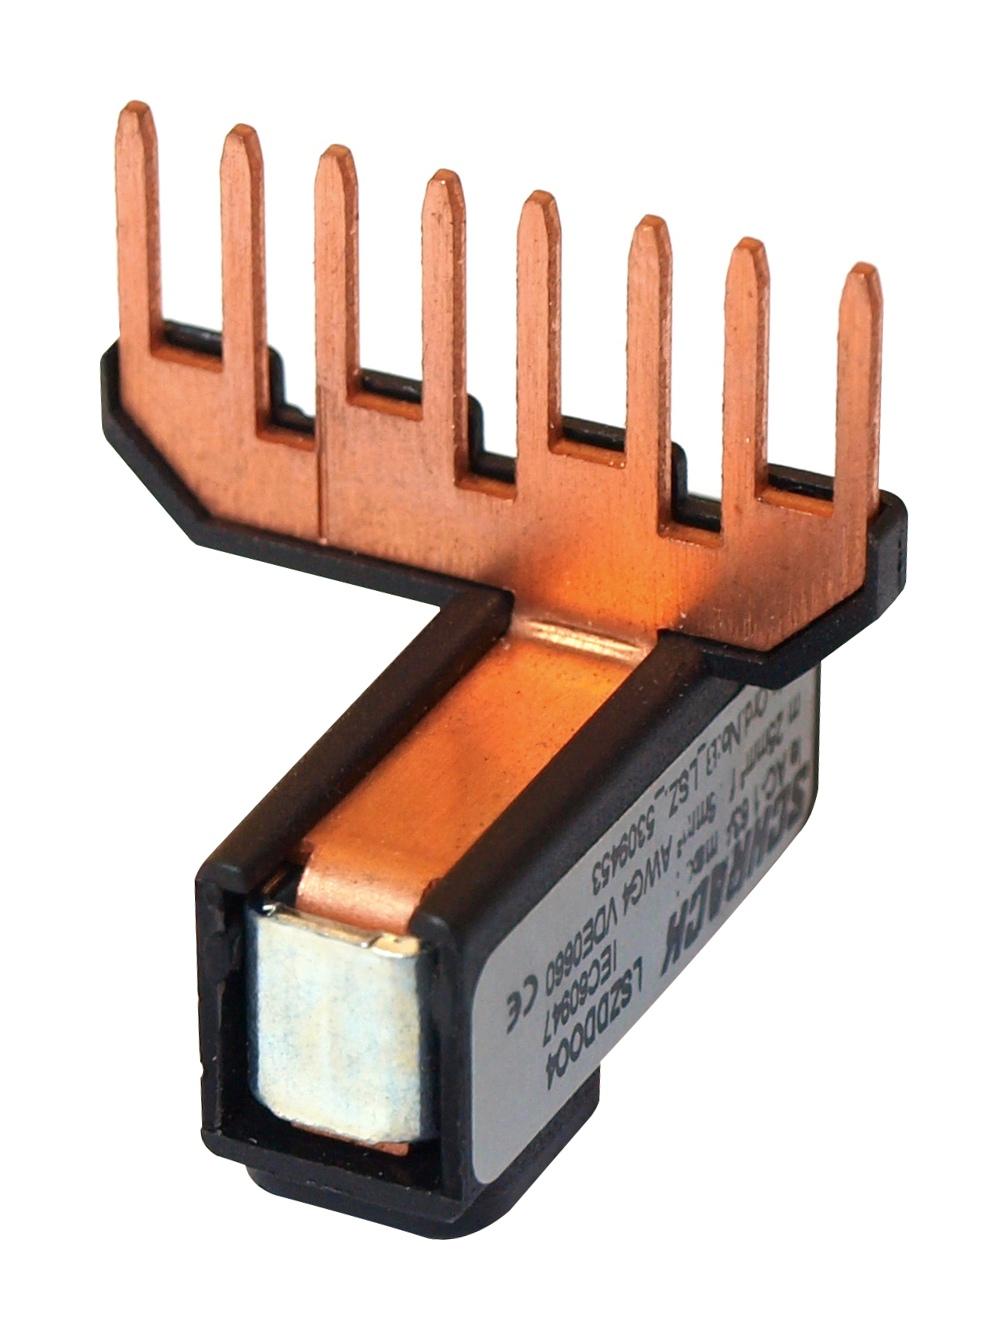 1 Stk Parallelschaltverbinder 4-polig, Bgr. 00, 25mm² LSZDD004--